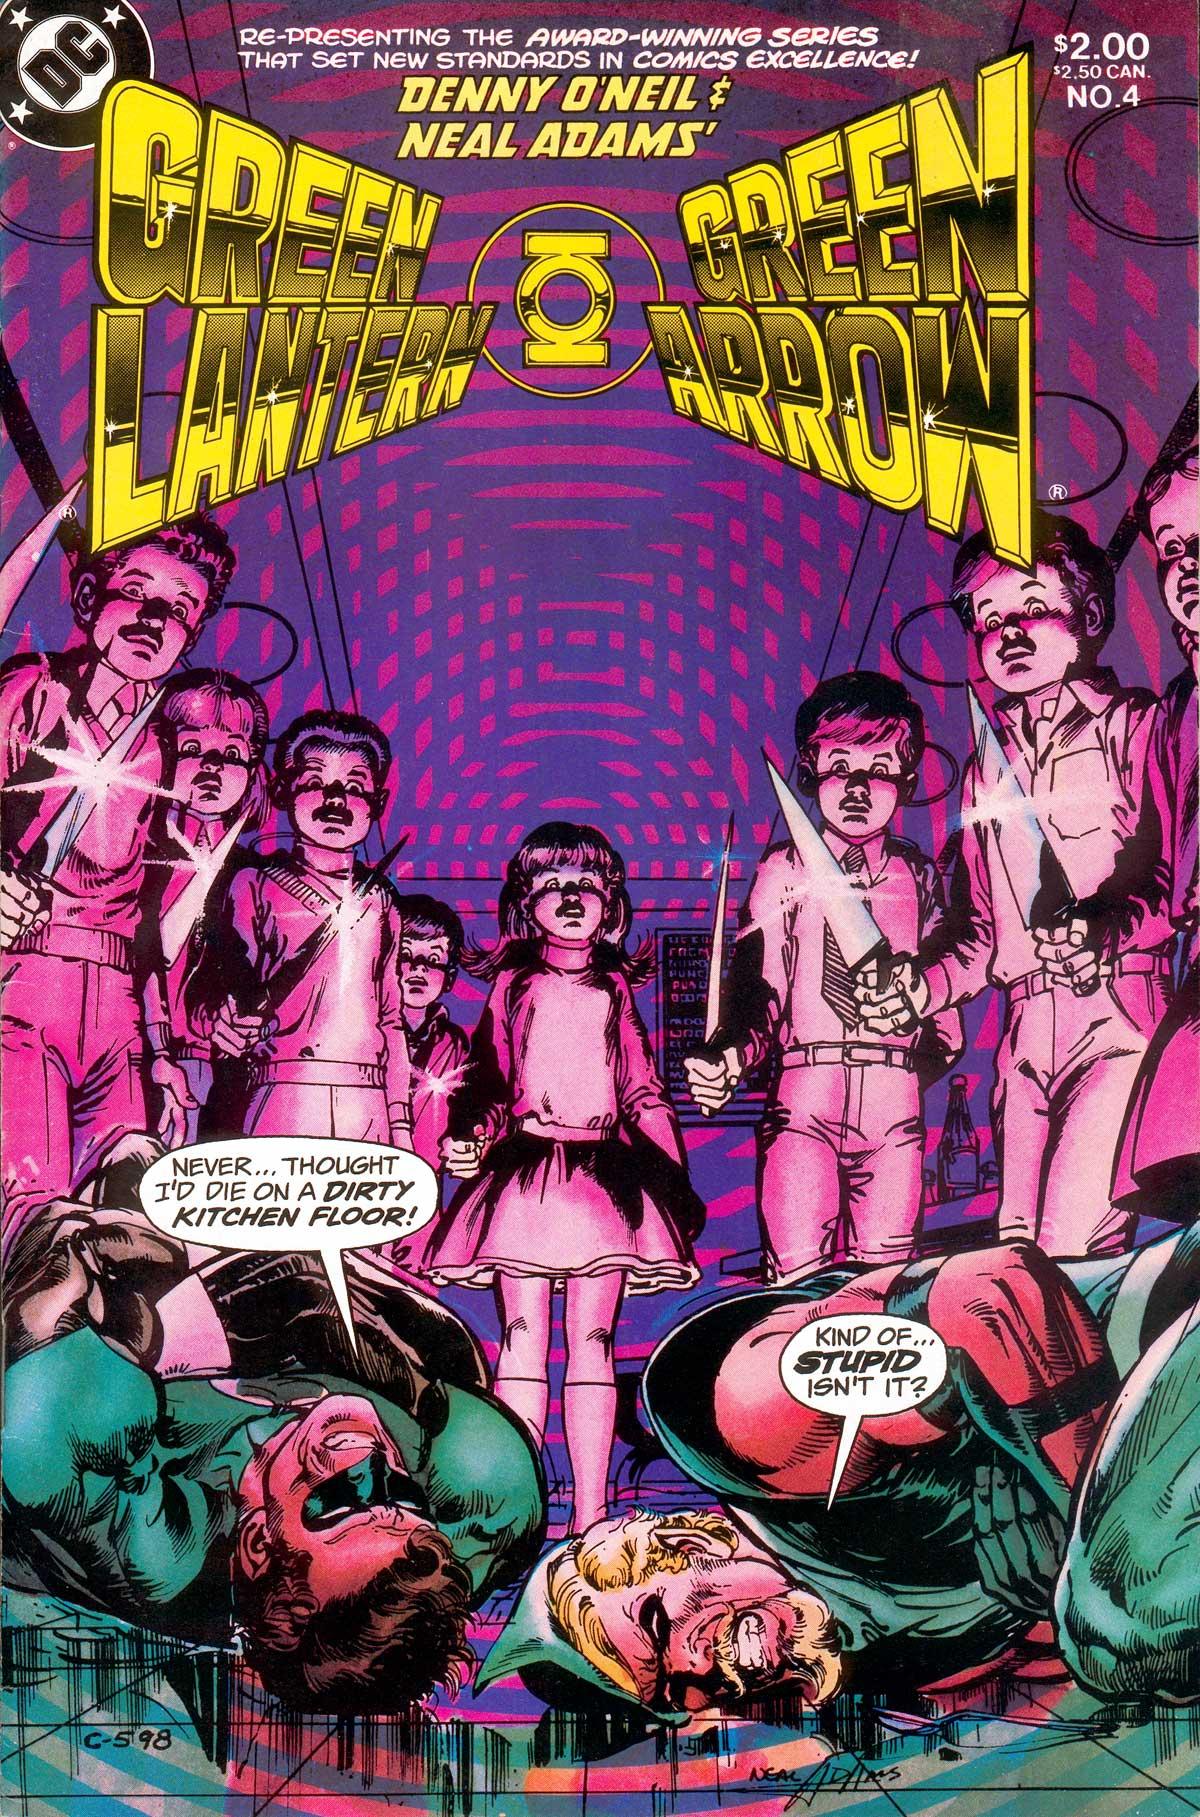 Green Lantern/Green Arrow Vol 1 4